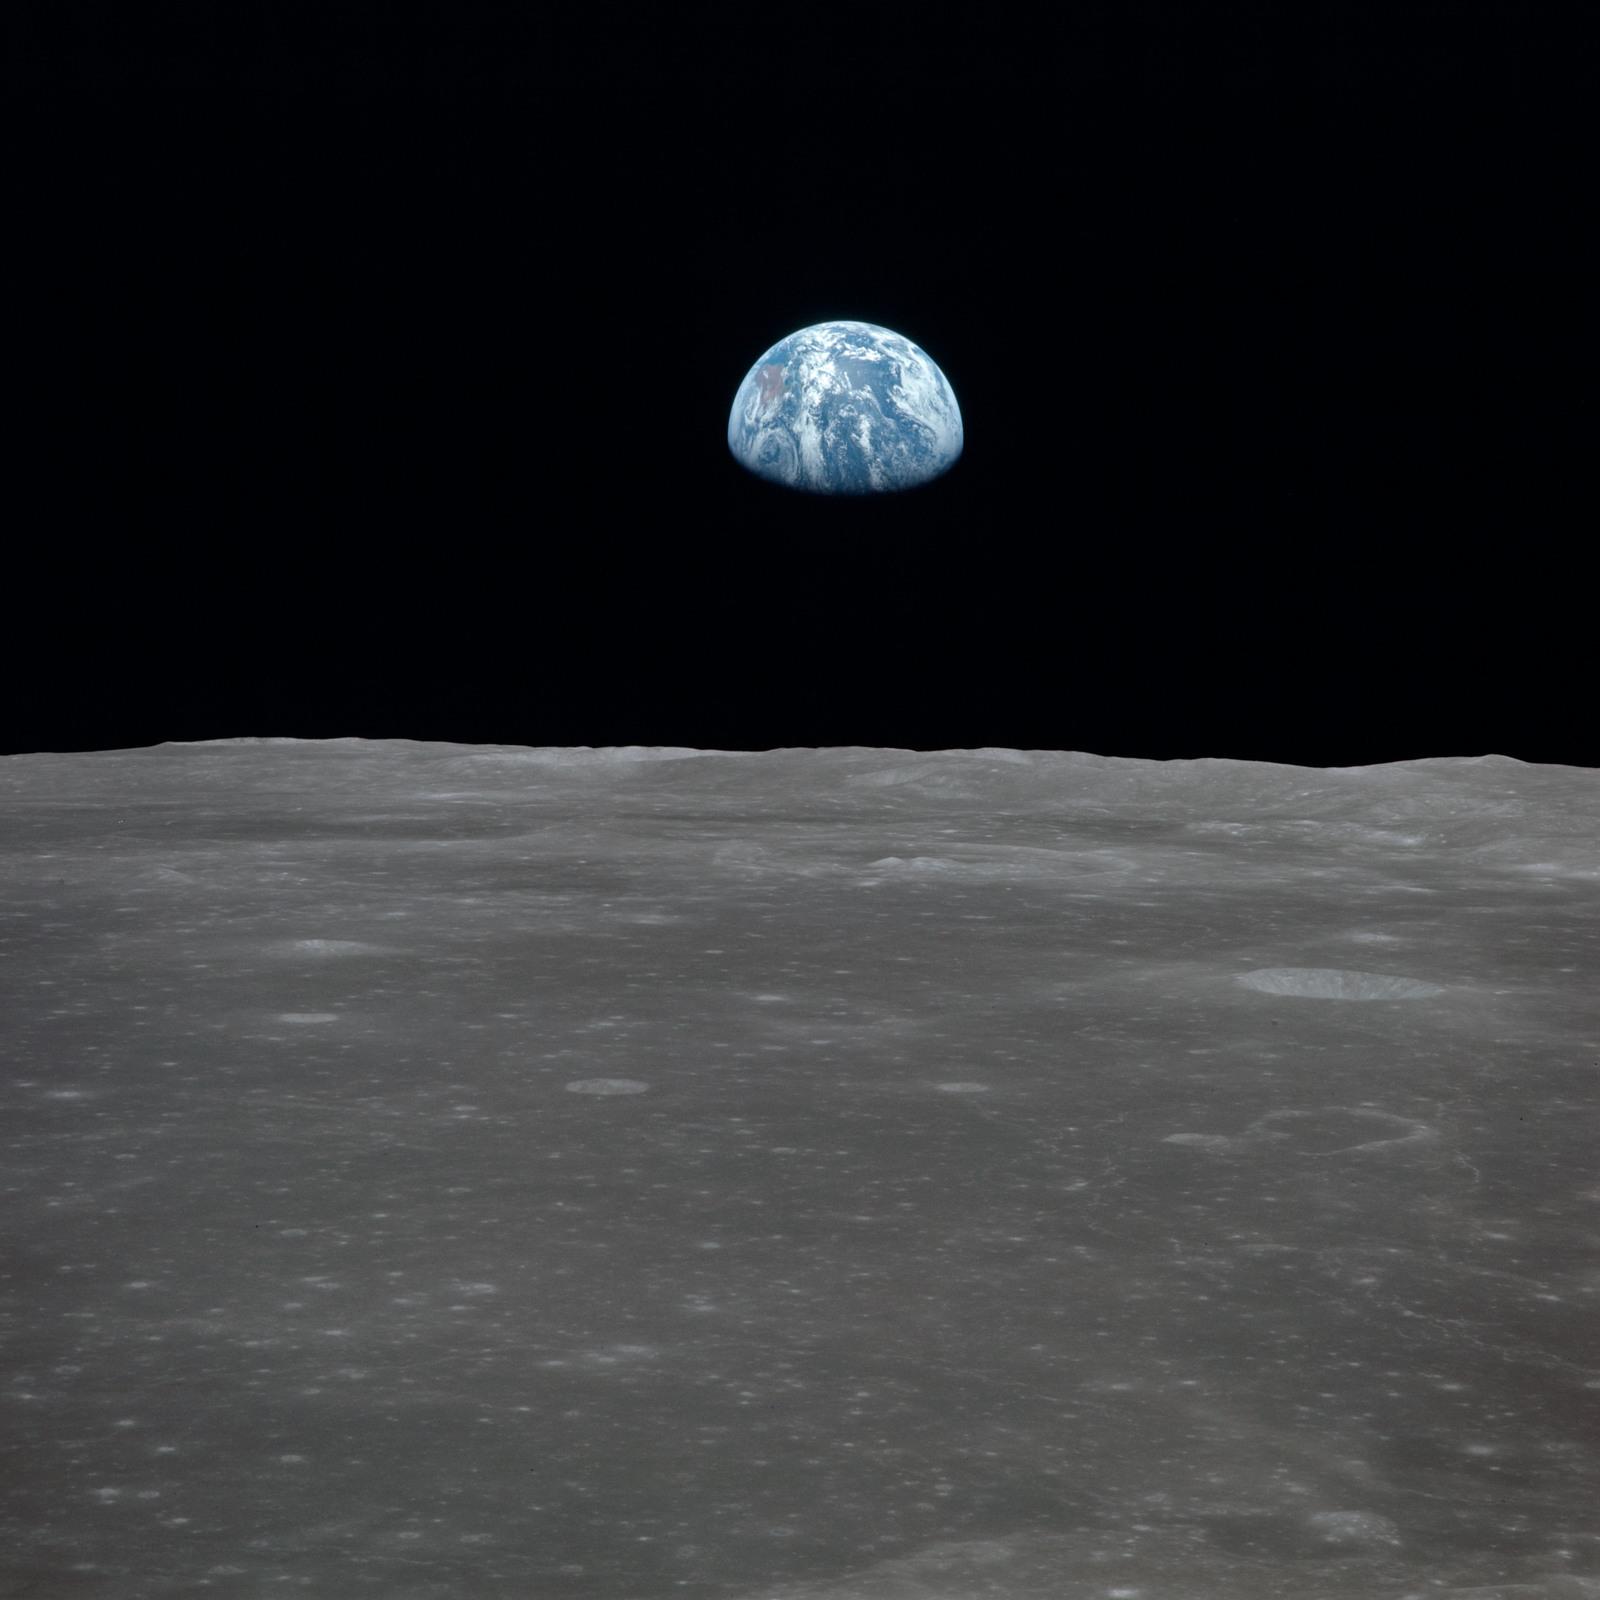 AS11-44-6556 - Apollo 11 - Apollo 11 Mission image - View of moon limb, with Earth on the horizon, Mare Smythii Region